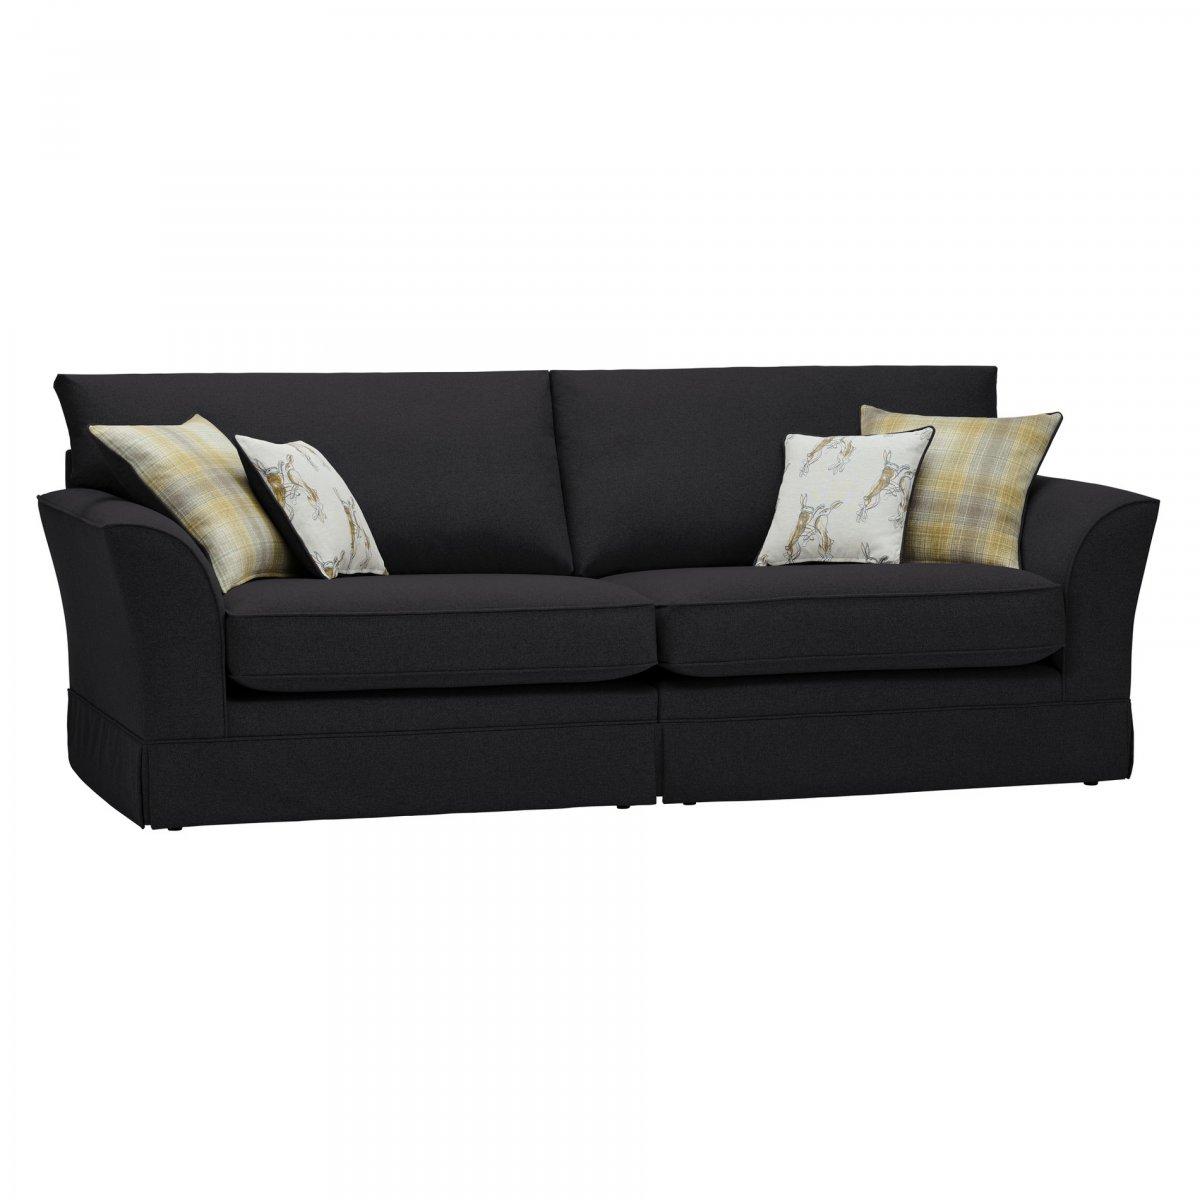 liberty 4 seater sofa in hawkshead charcoal fabric. Black Bedroom Furniture Sets. Home Design Ideas